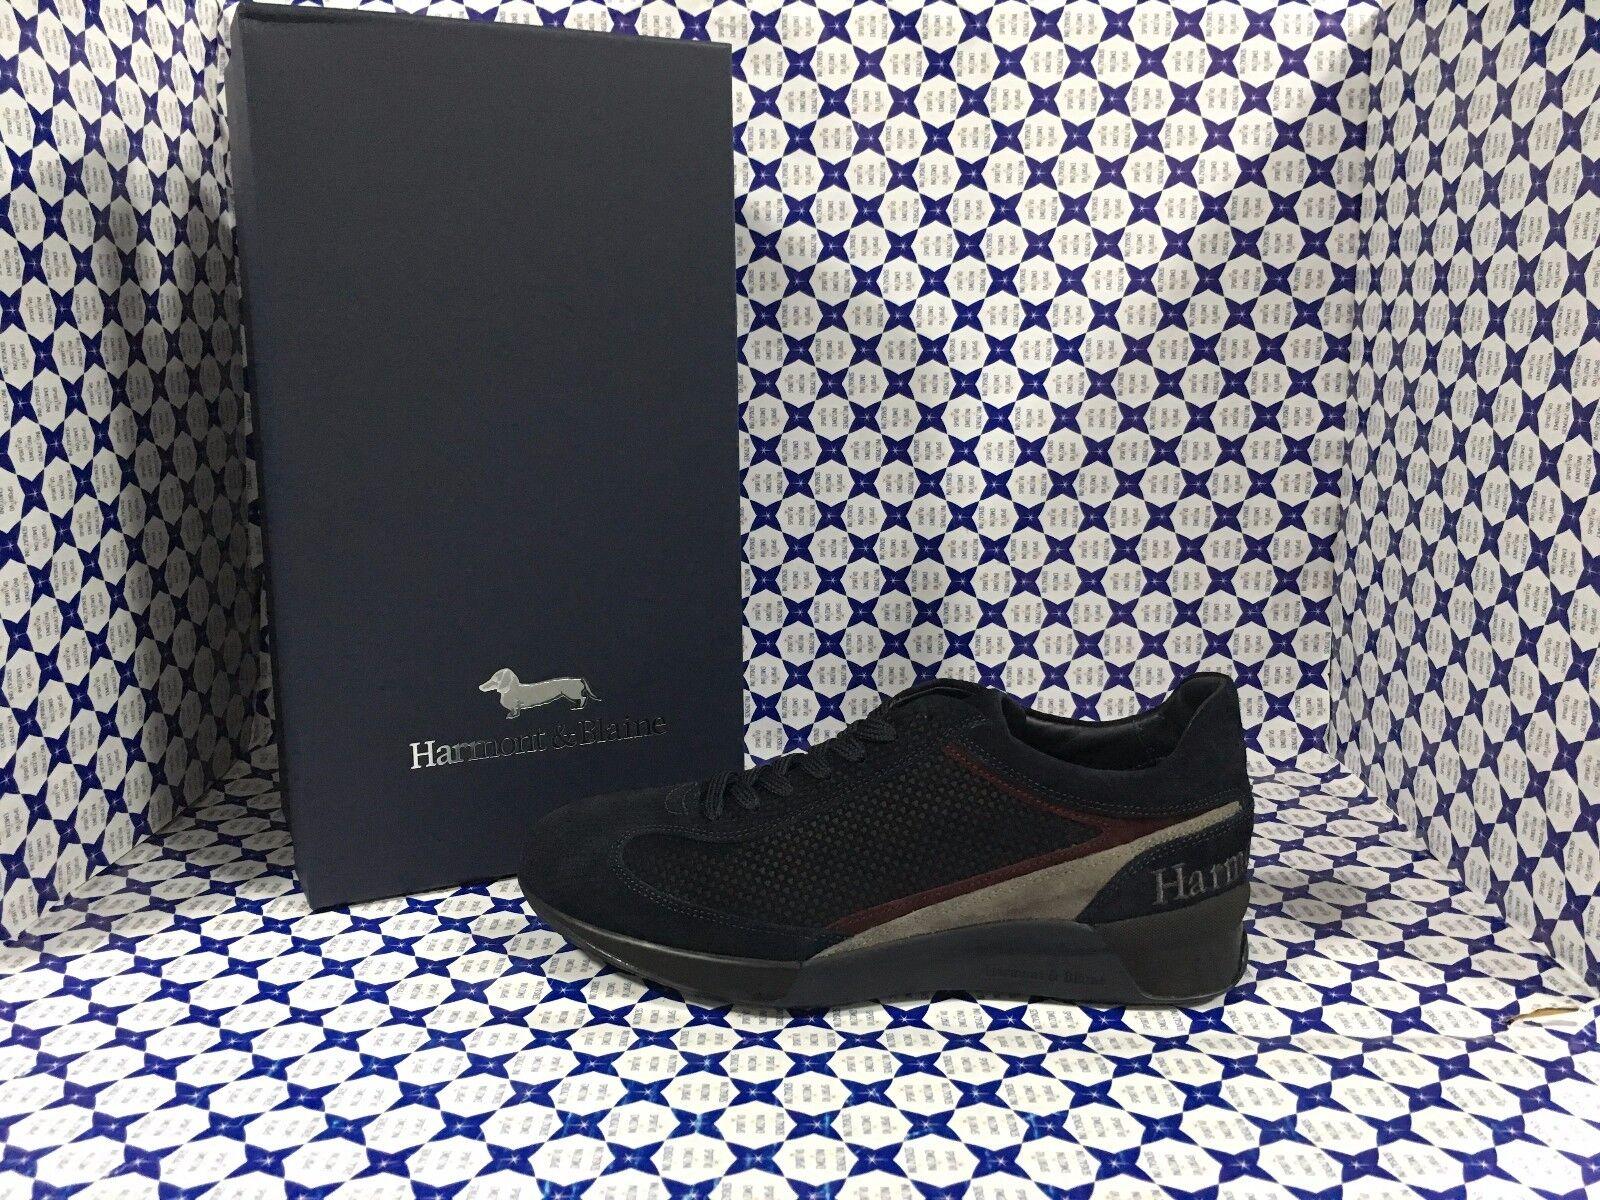 Scarpe HARMONT & & & BLAINE Uomo - scarpe da ginnastica Scamosciata Piedipull - Blu Navy - E9063 691bef